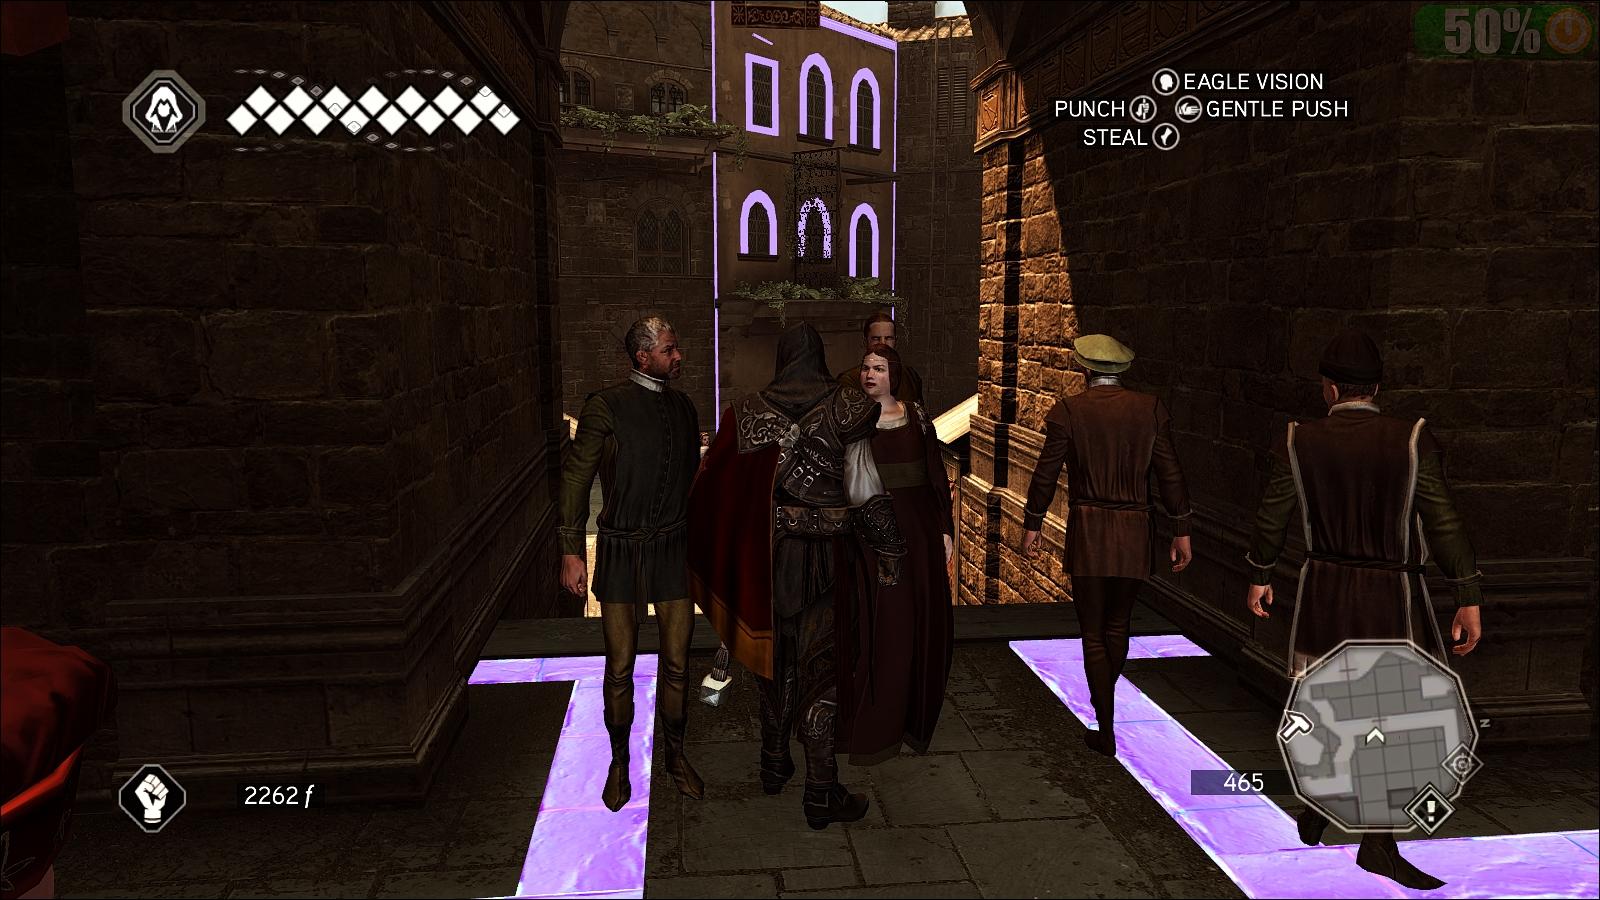 AssassinsCreedIIGame.exe_DX9_20140211_164128.jpg